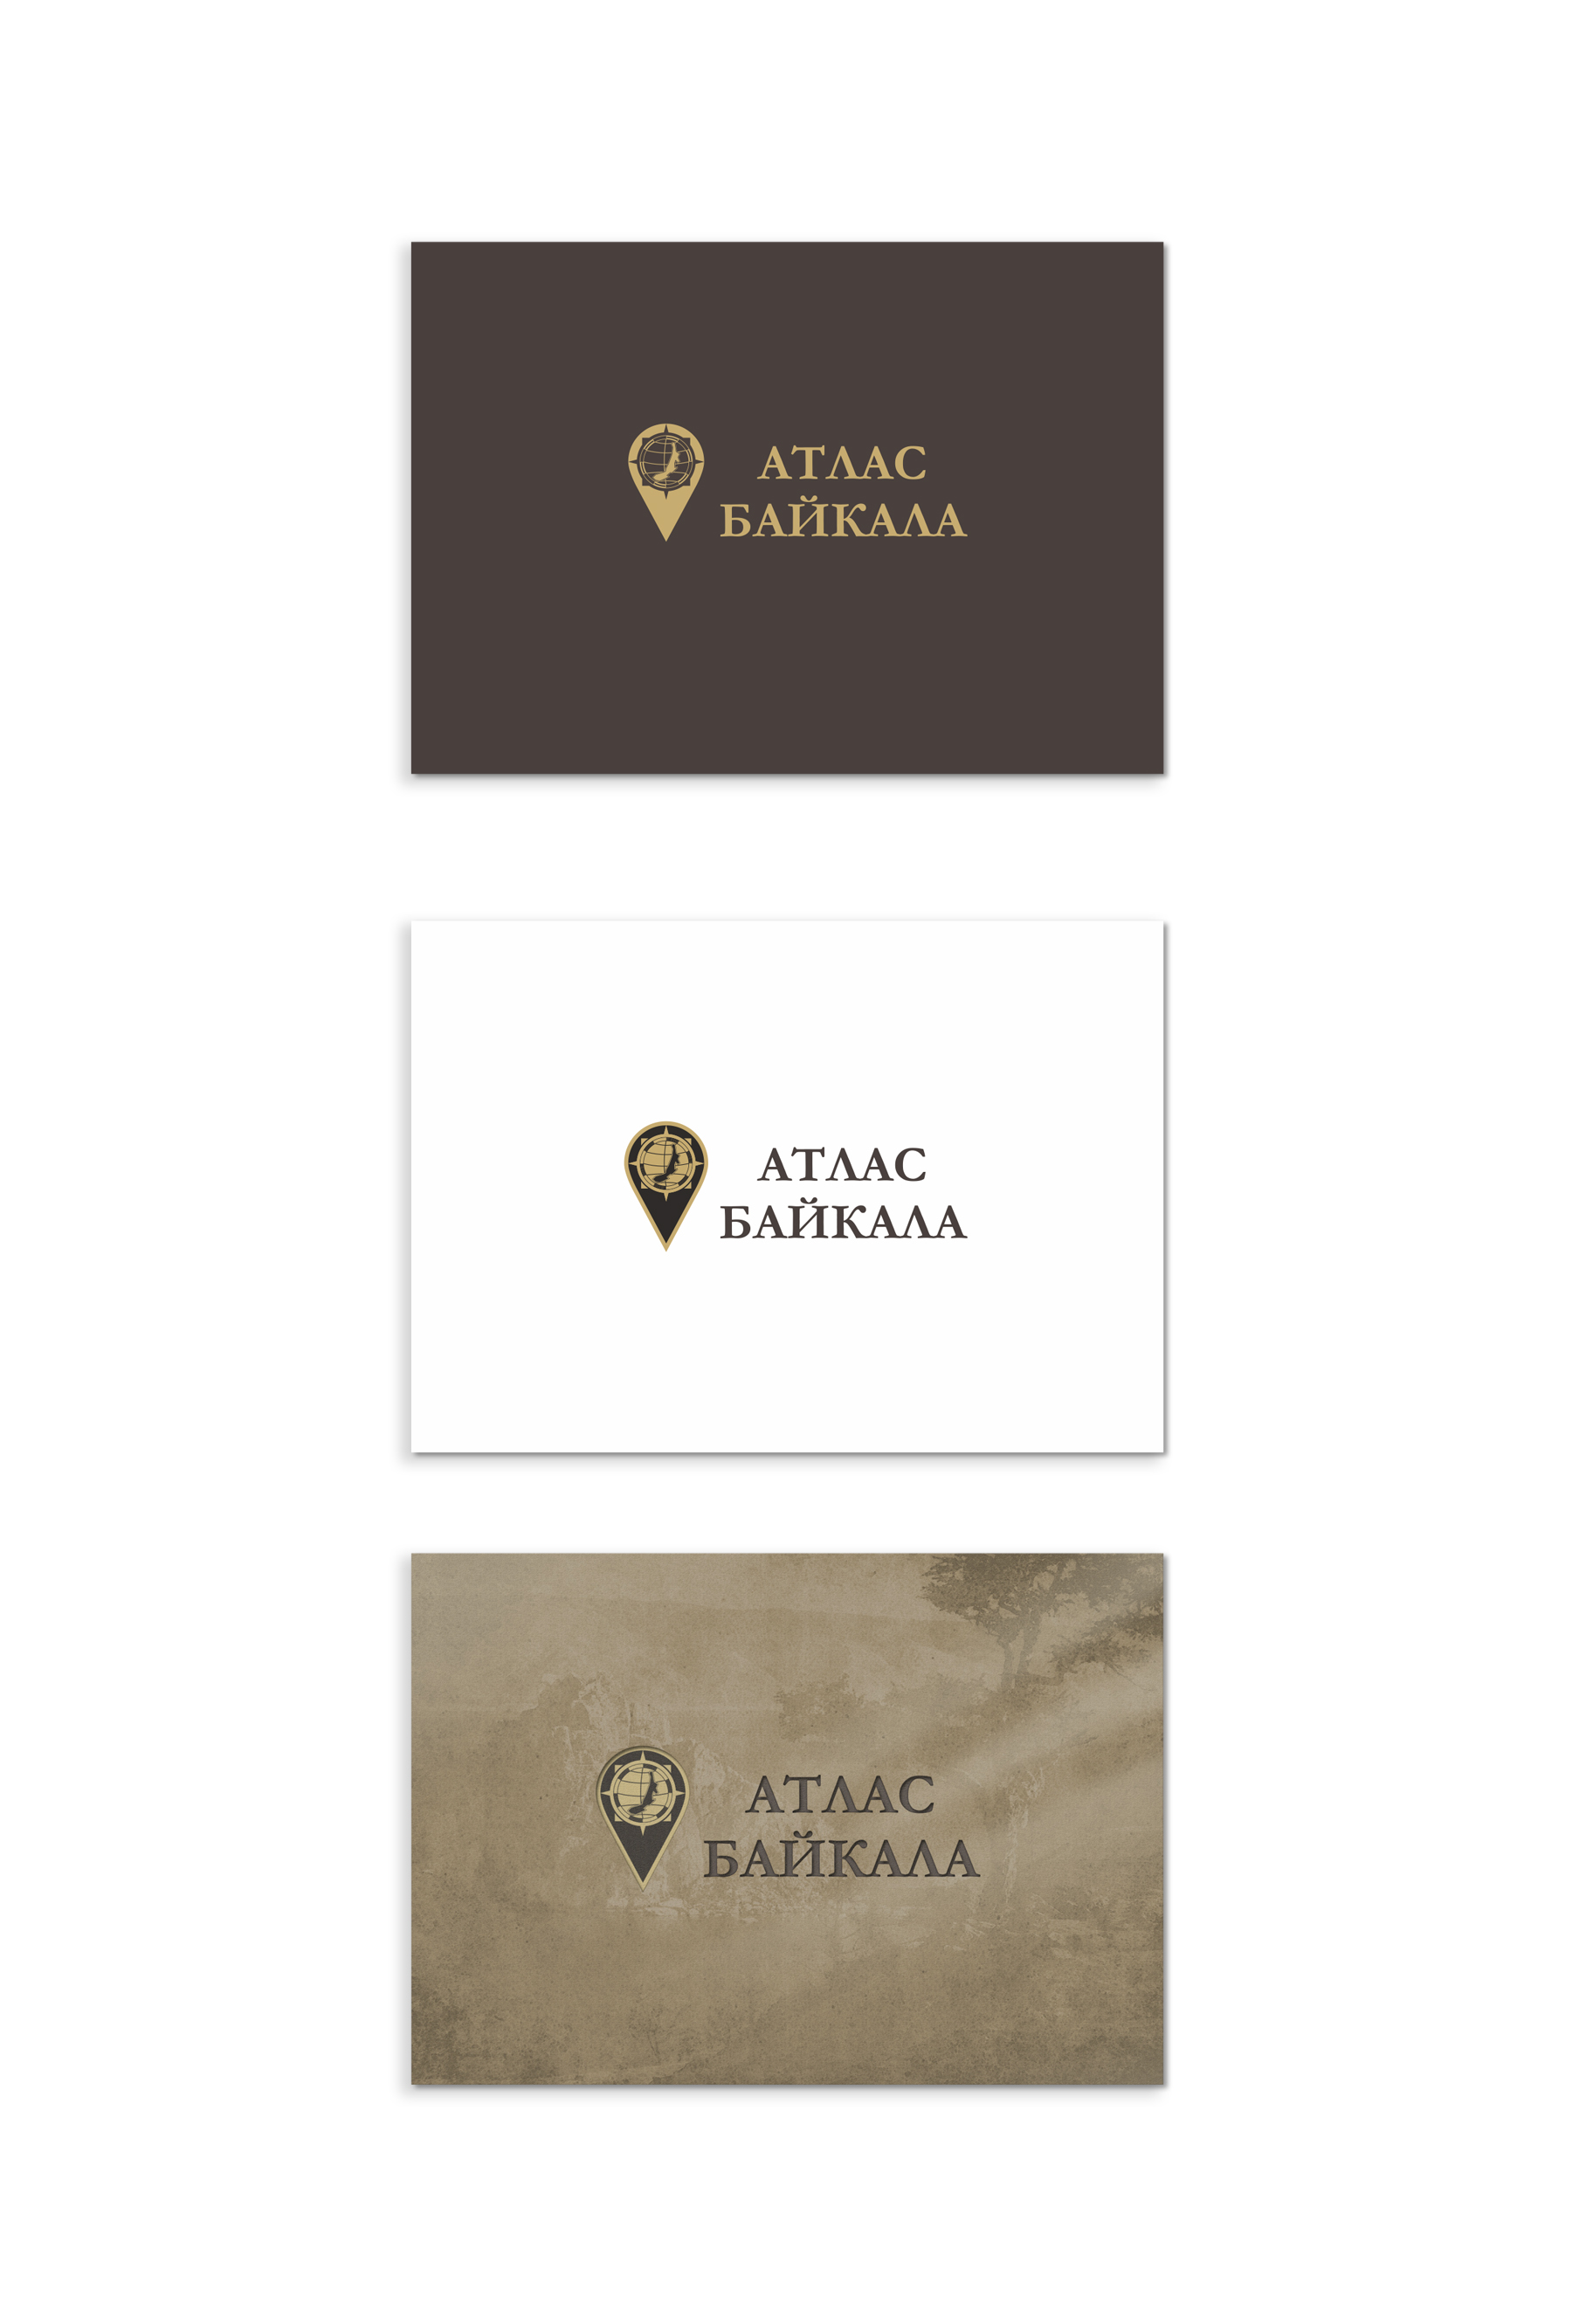 Разработка логотипа Атлас Байкала фото f_3885afae6a104468.jpg